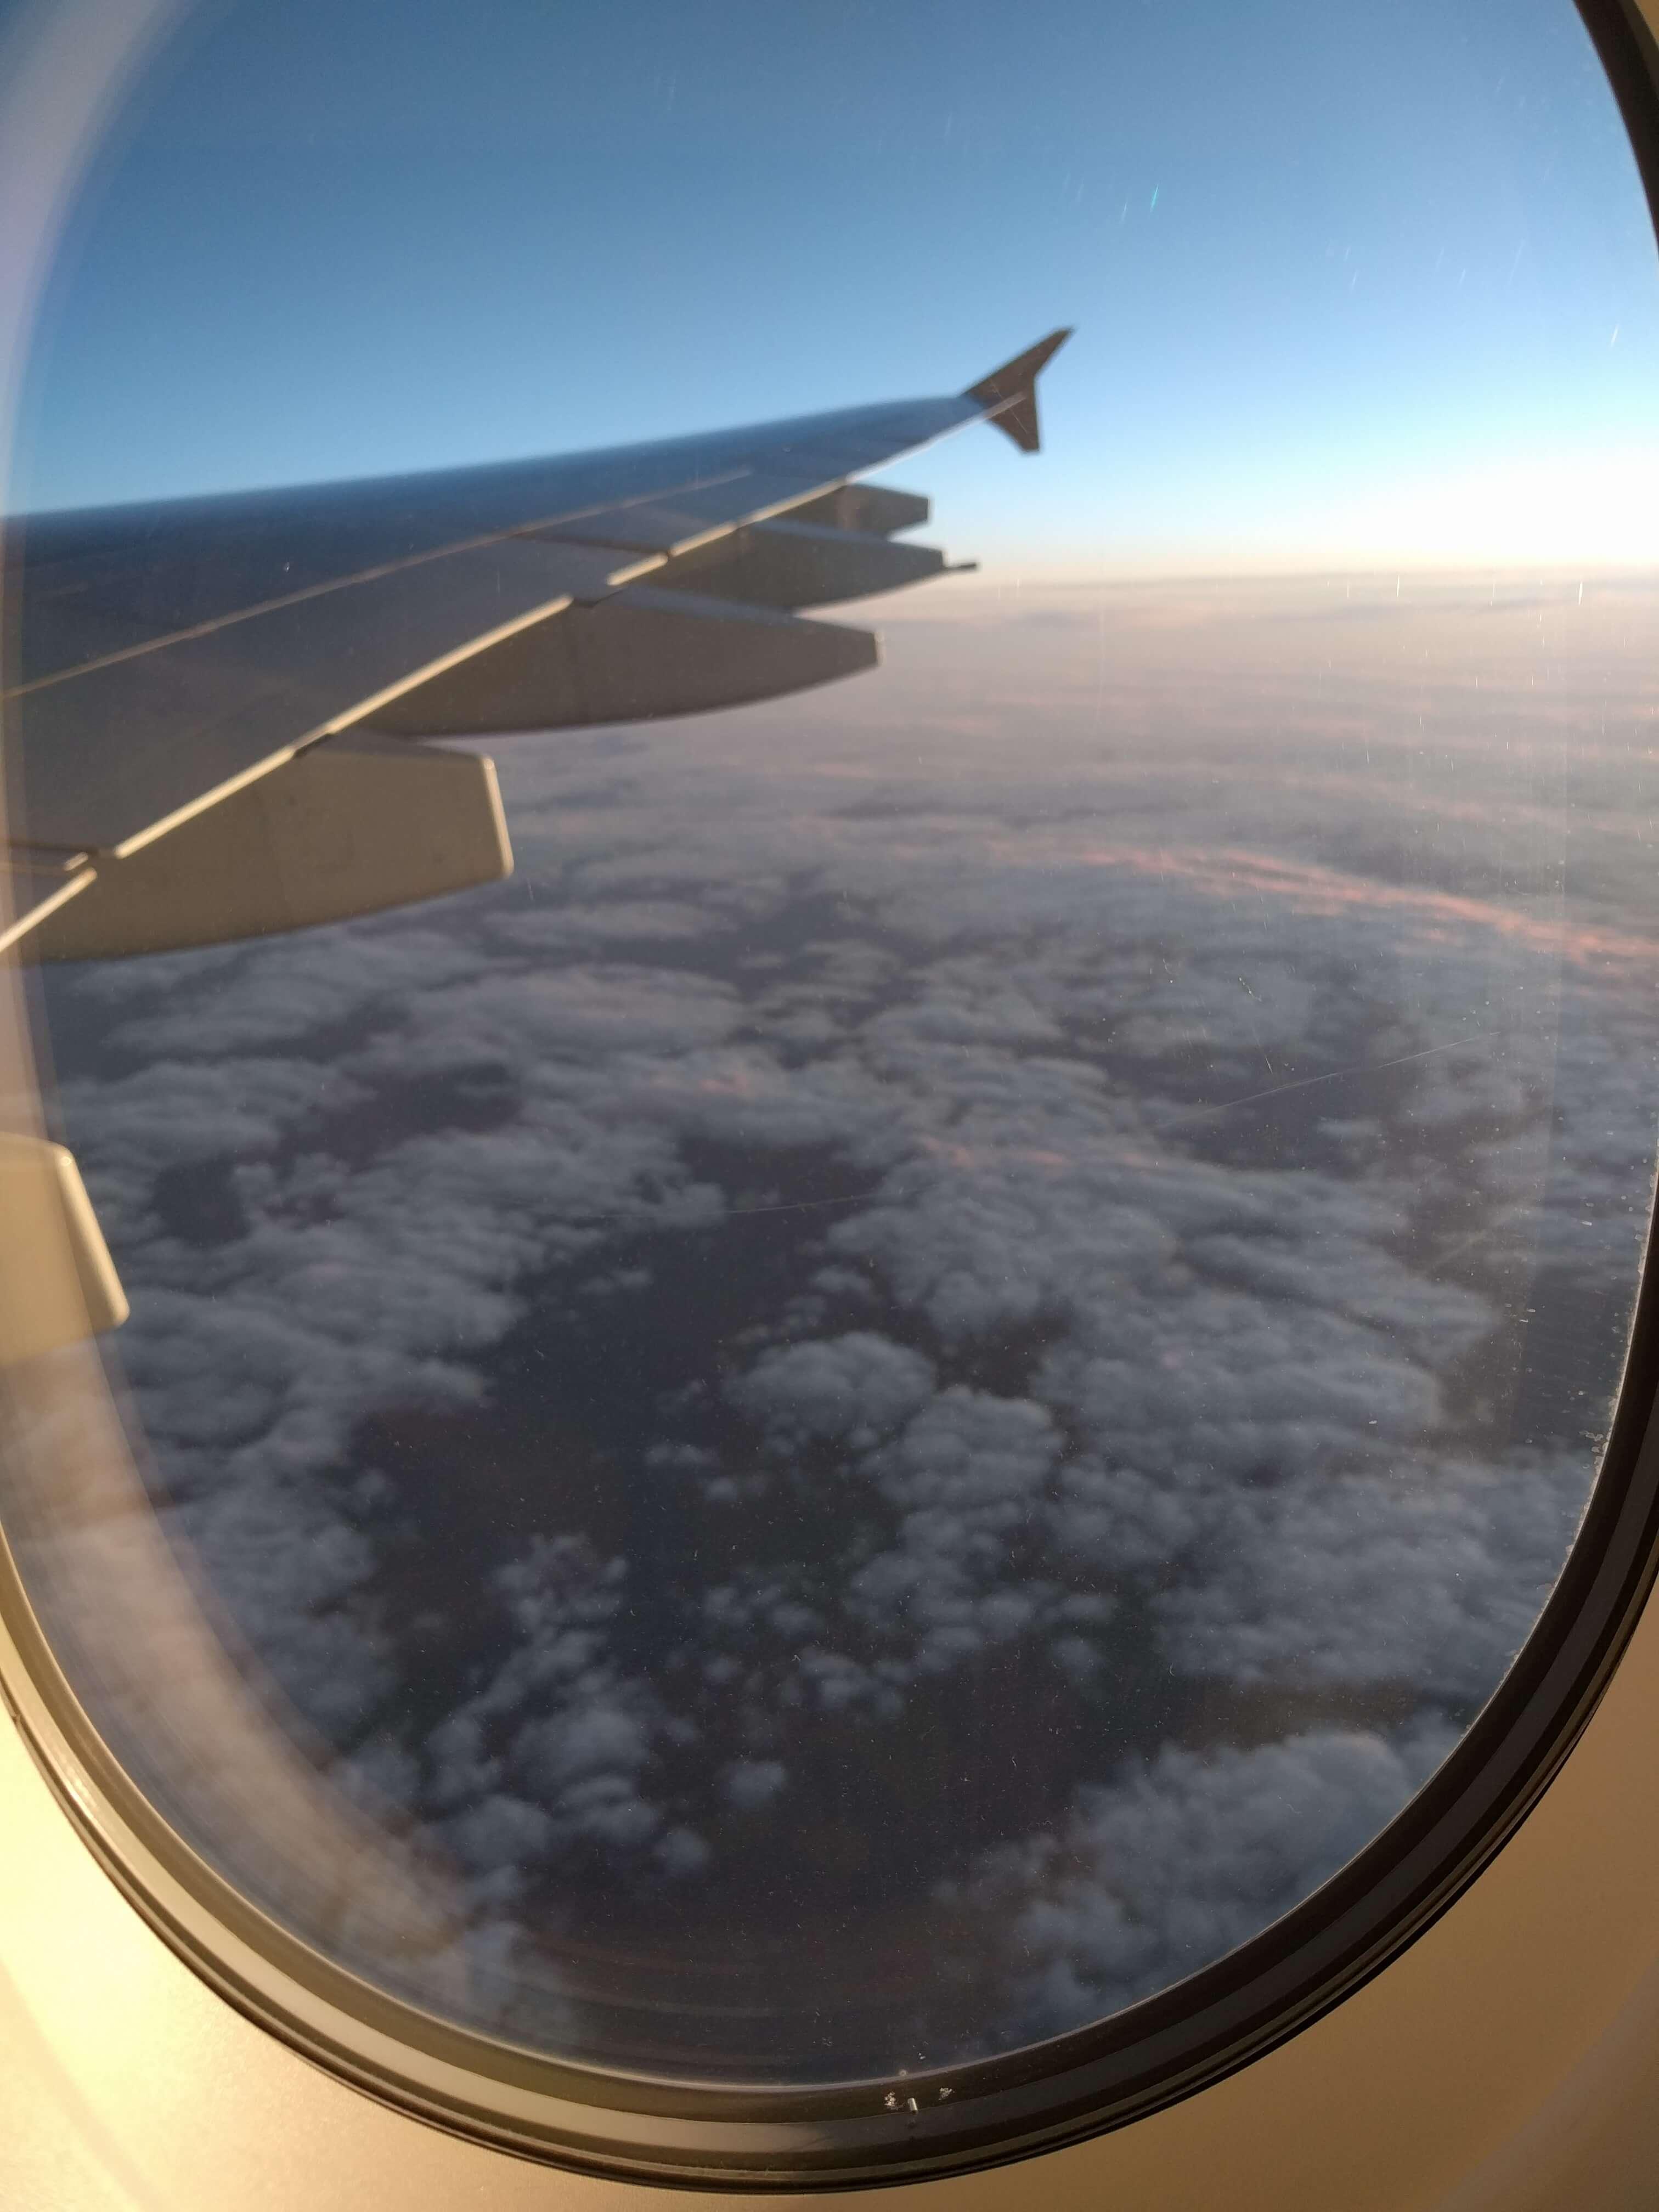 High above Australia